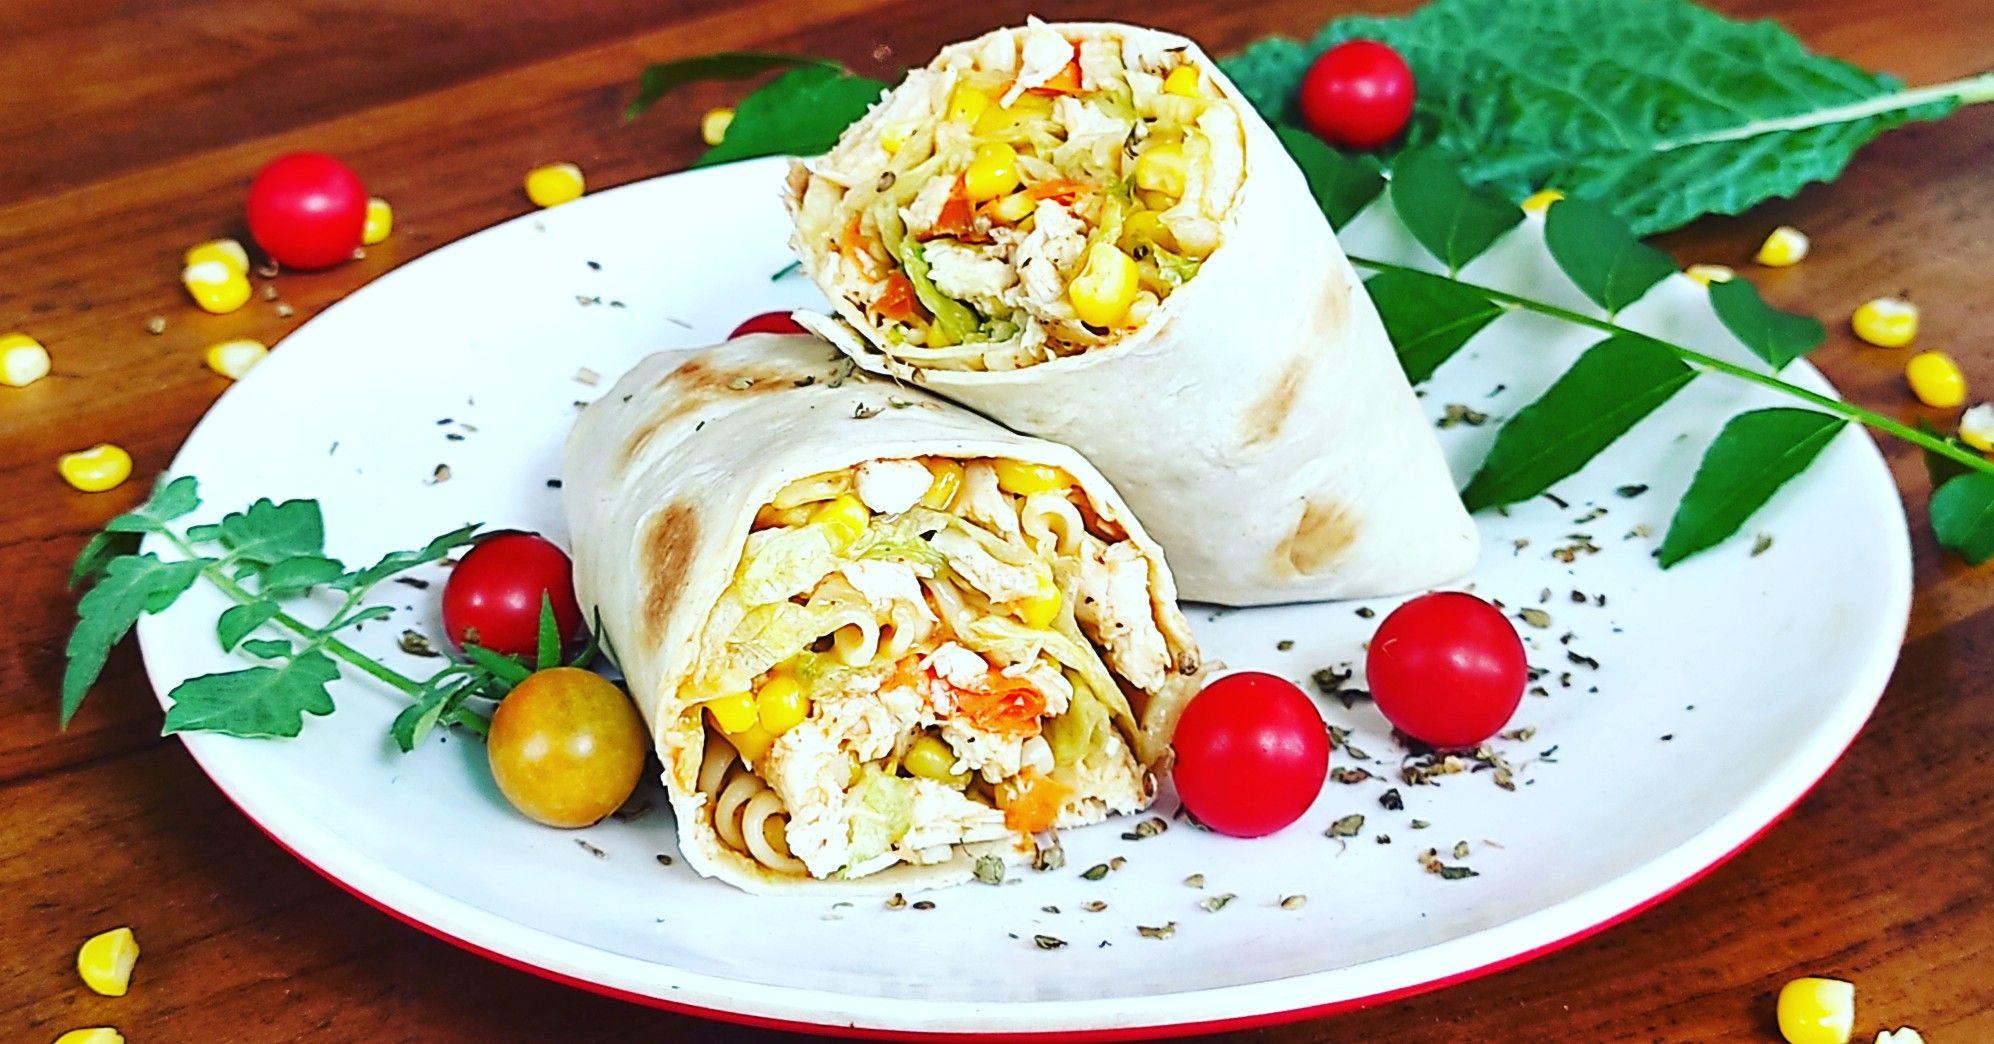 Salad Wrap Chicken In 2020 Salad Wraps Chicken Wraps Food